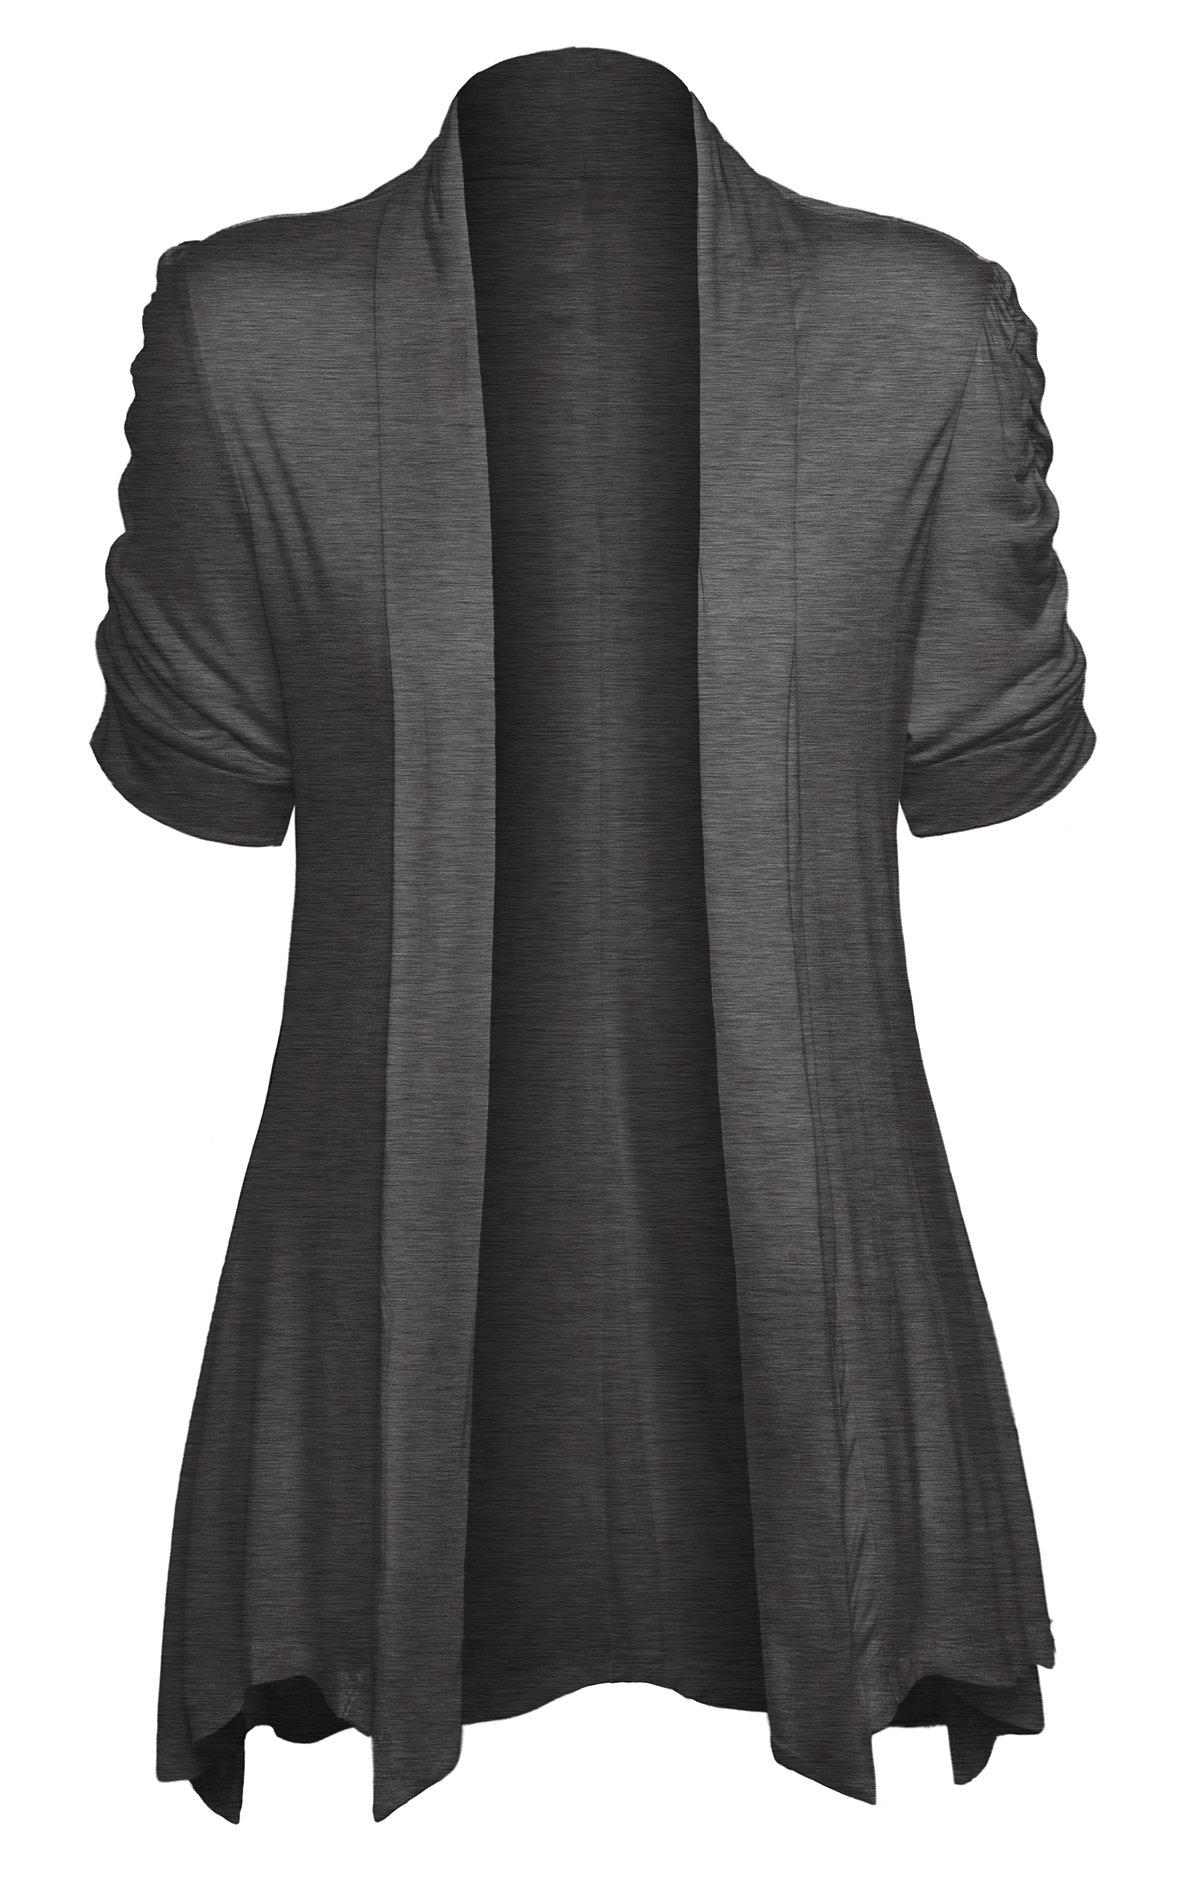 Women's Open Front Ruched Short Sleeve Shark Bite Hem Casual Plus Size Cardigan